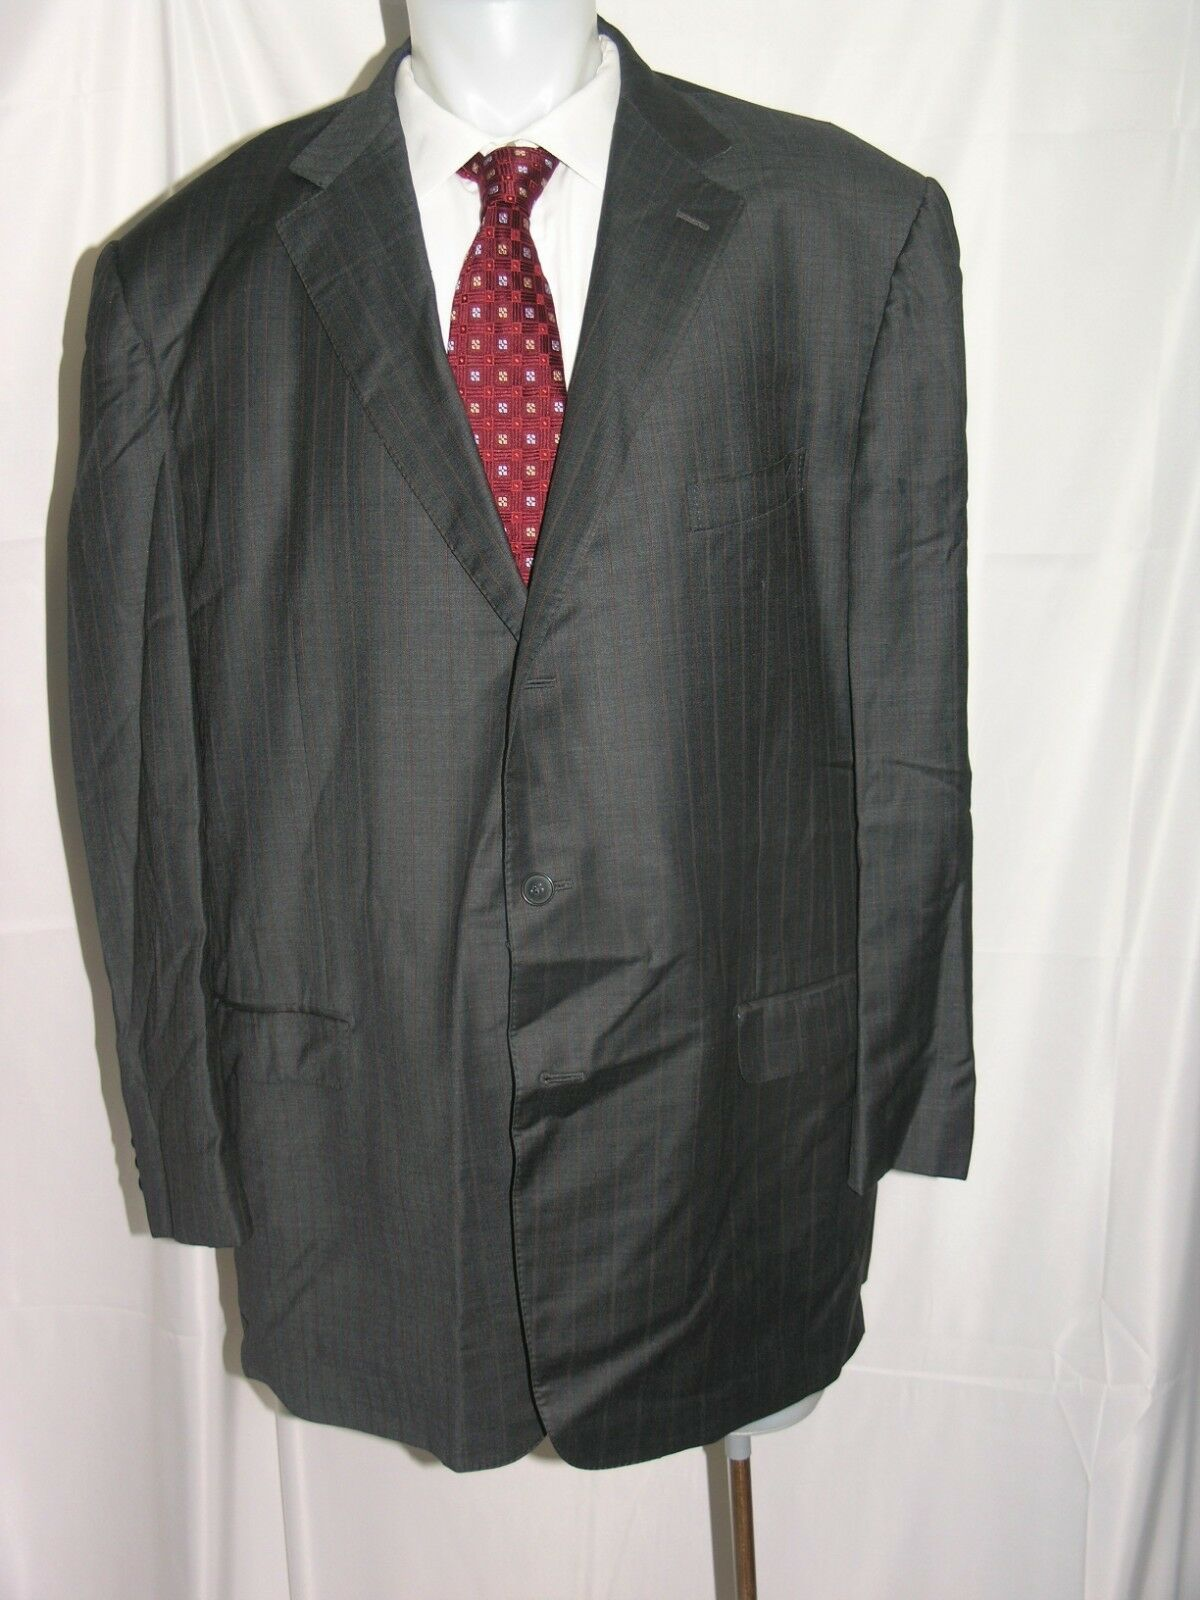 Ermänneregildo Zegna Transeasonal wolleSilk Three Roll Two Suit jacke 54 XL